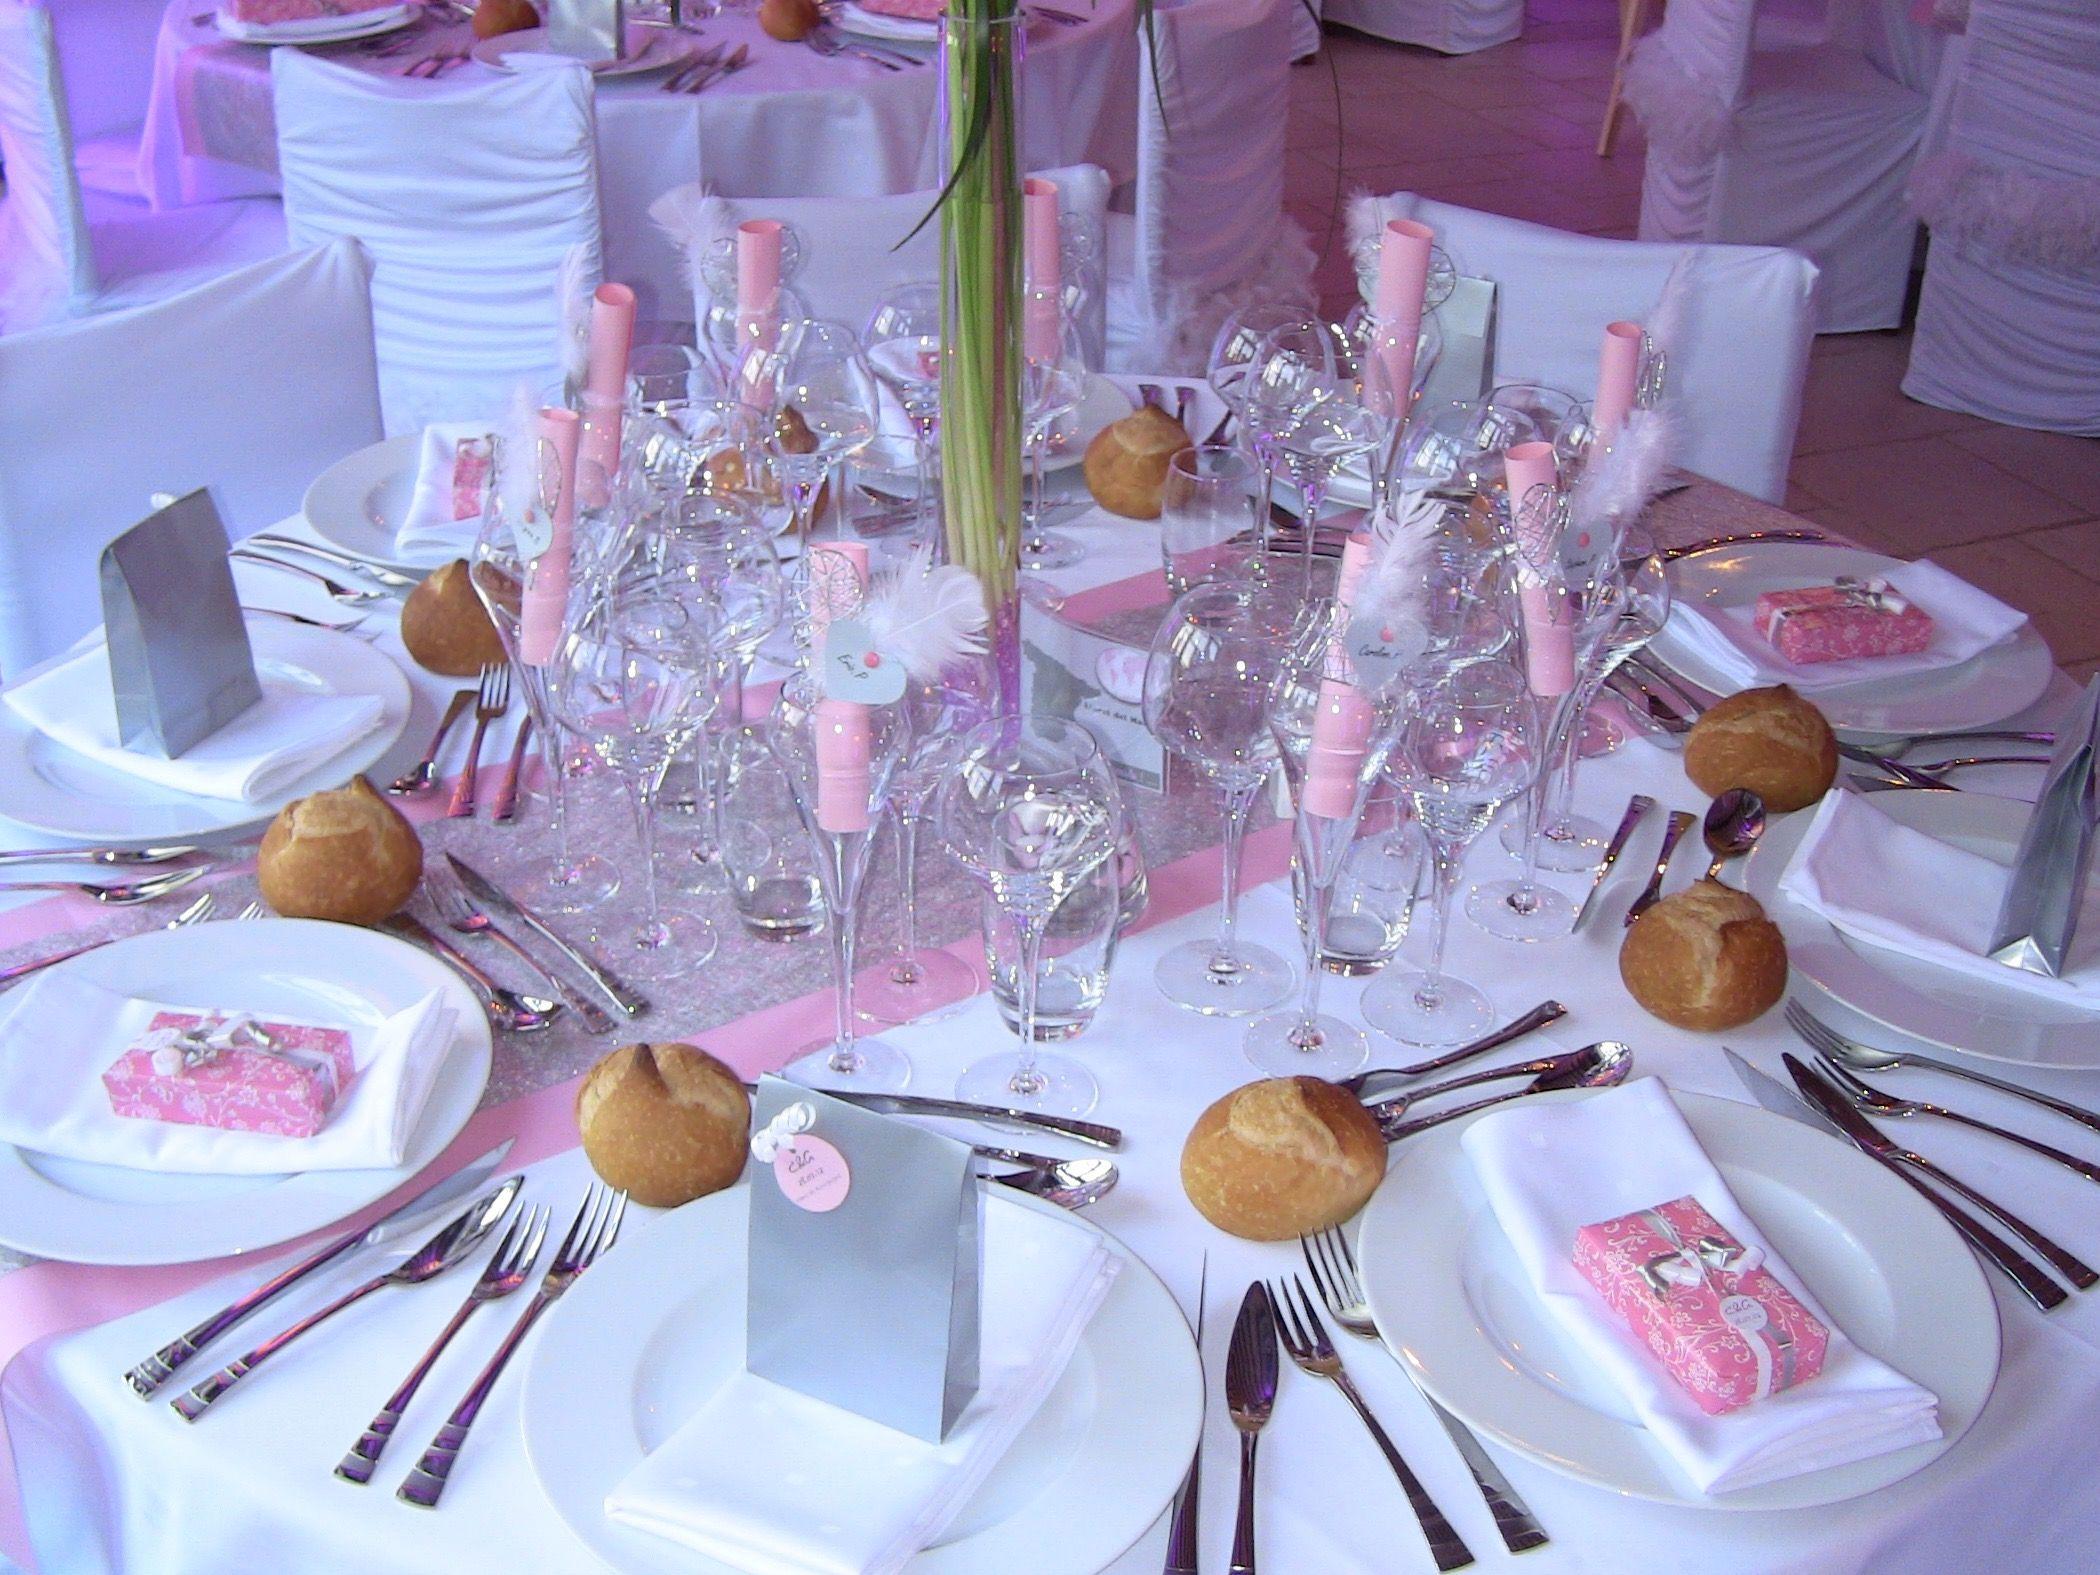 decoration table mariage rose et gris fashion designs. Black Bedroom Furniture Sets. Home Design Ideas